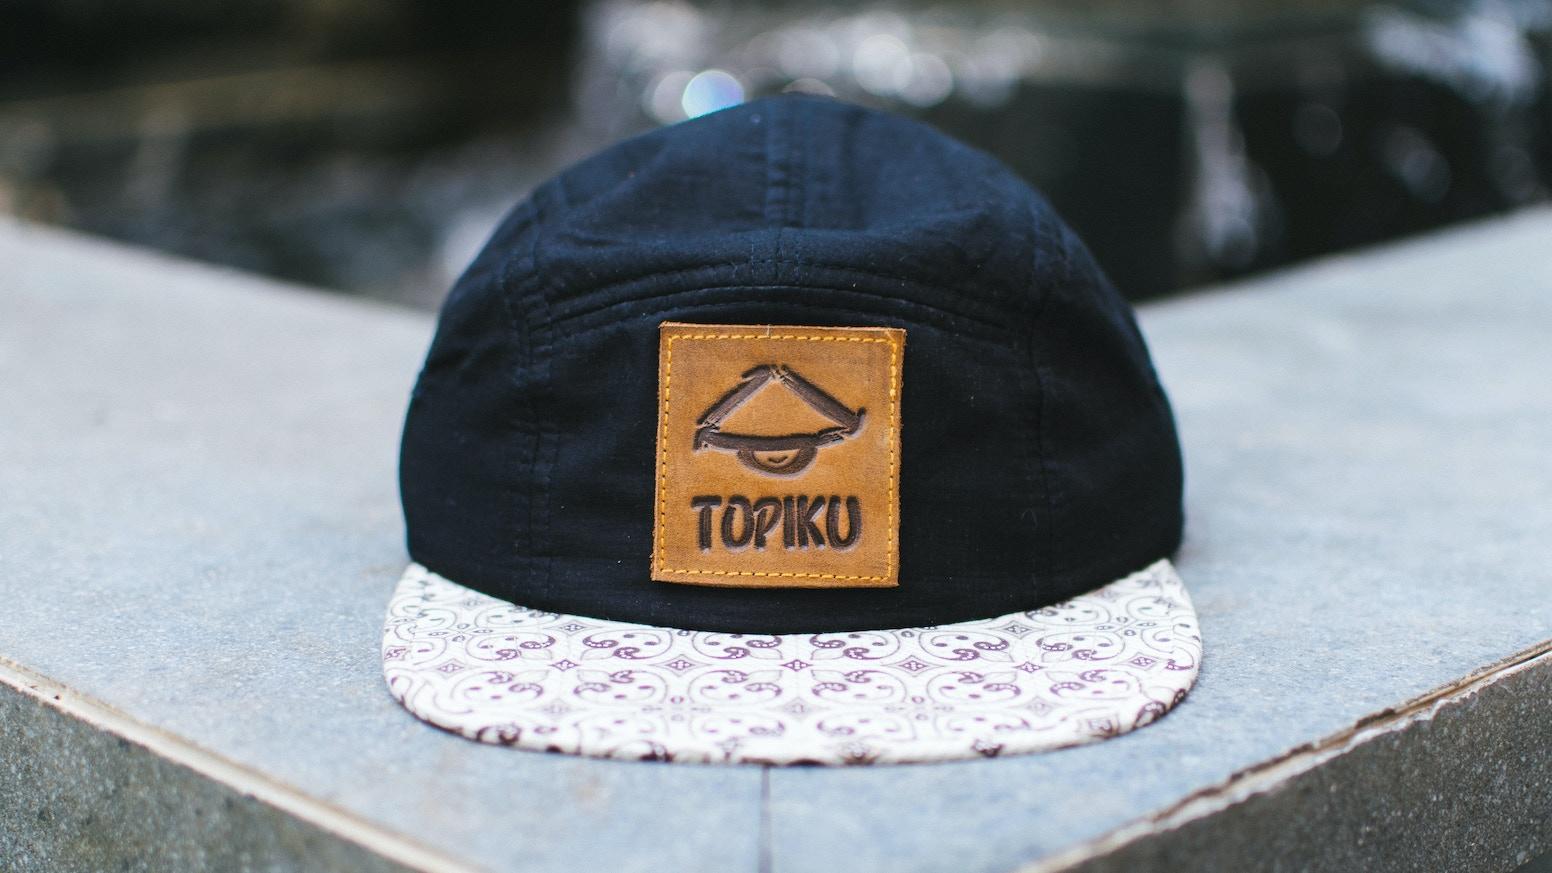 fb617f89f6f Topiku-World s Most Sustainable Snapback Hat by Topiku — Kickstarter